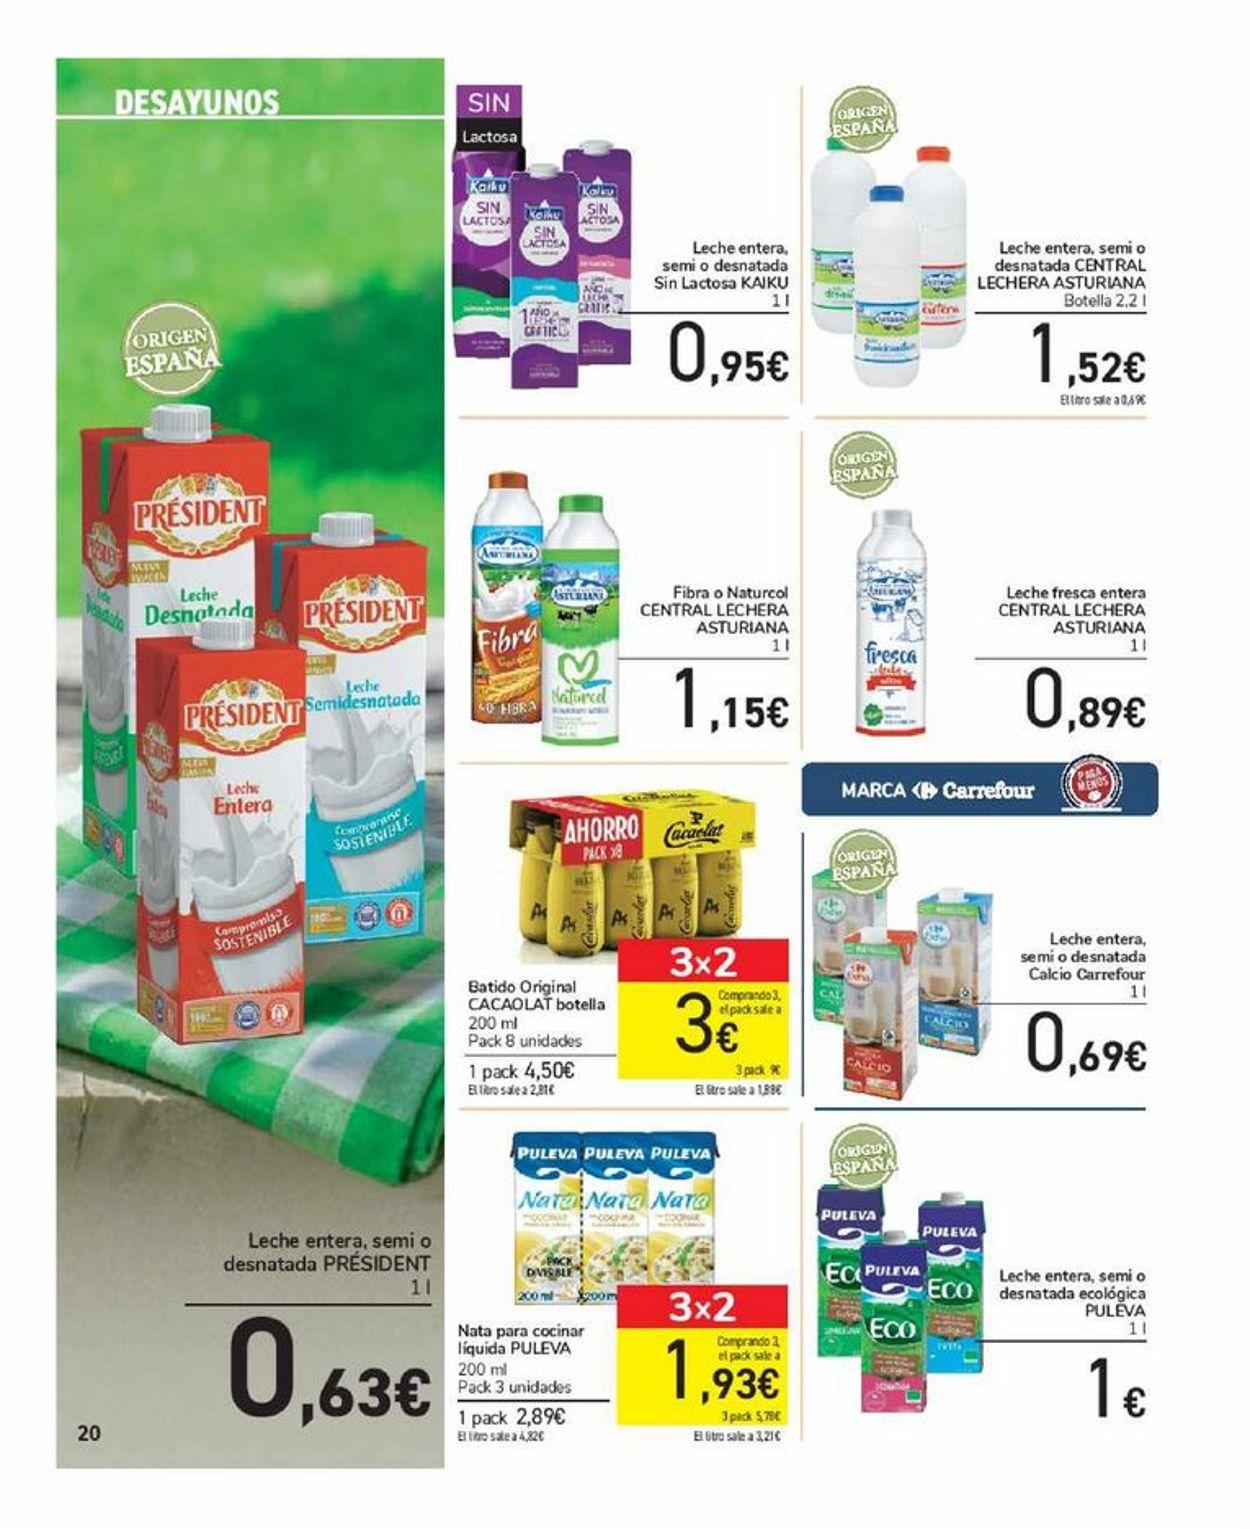 Carrefour Folleto - 17.06-29.06.2021 (Página 20)